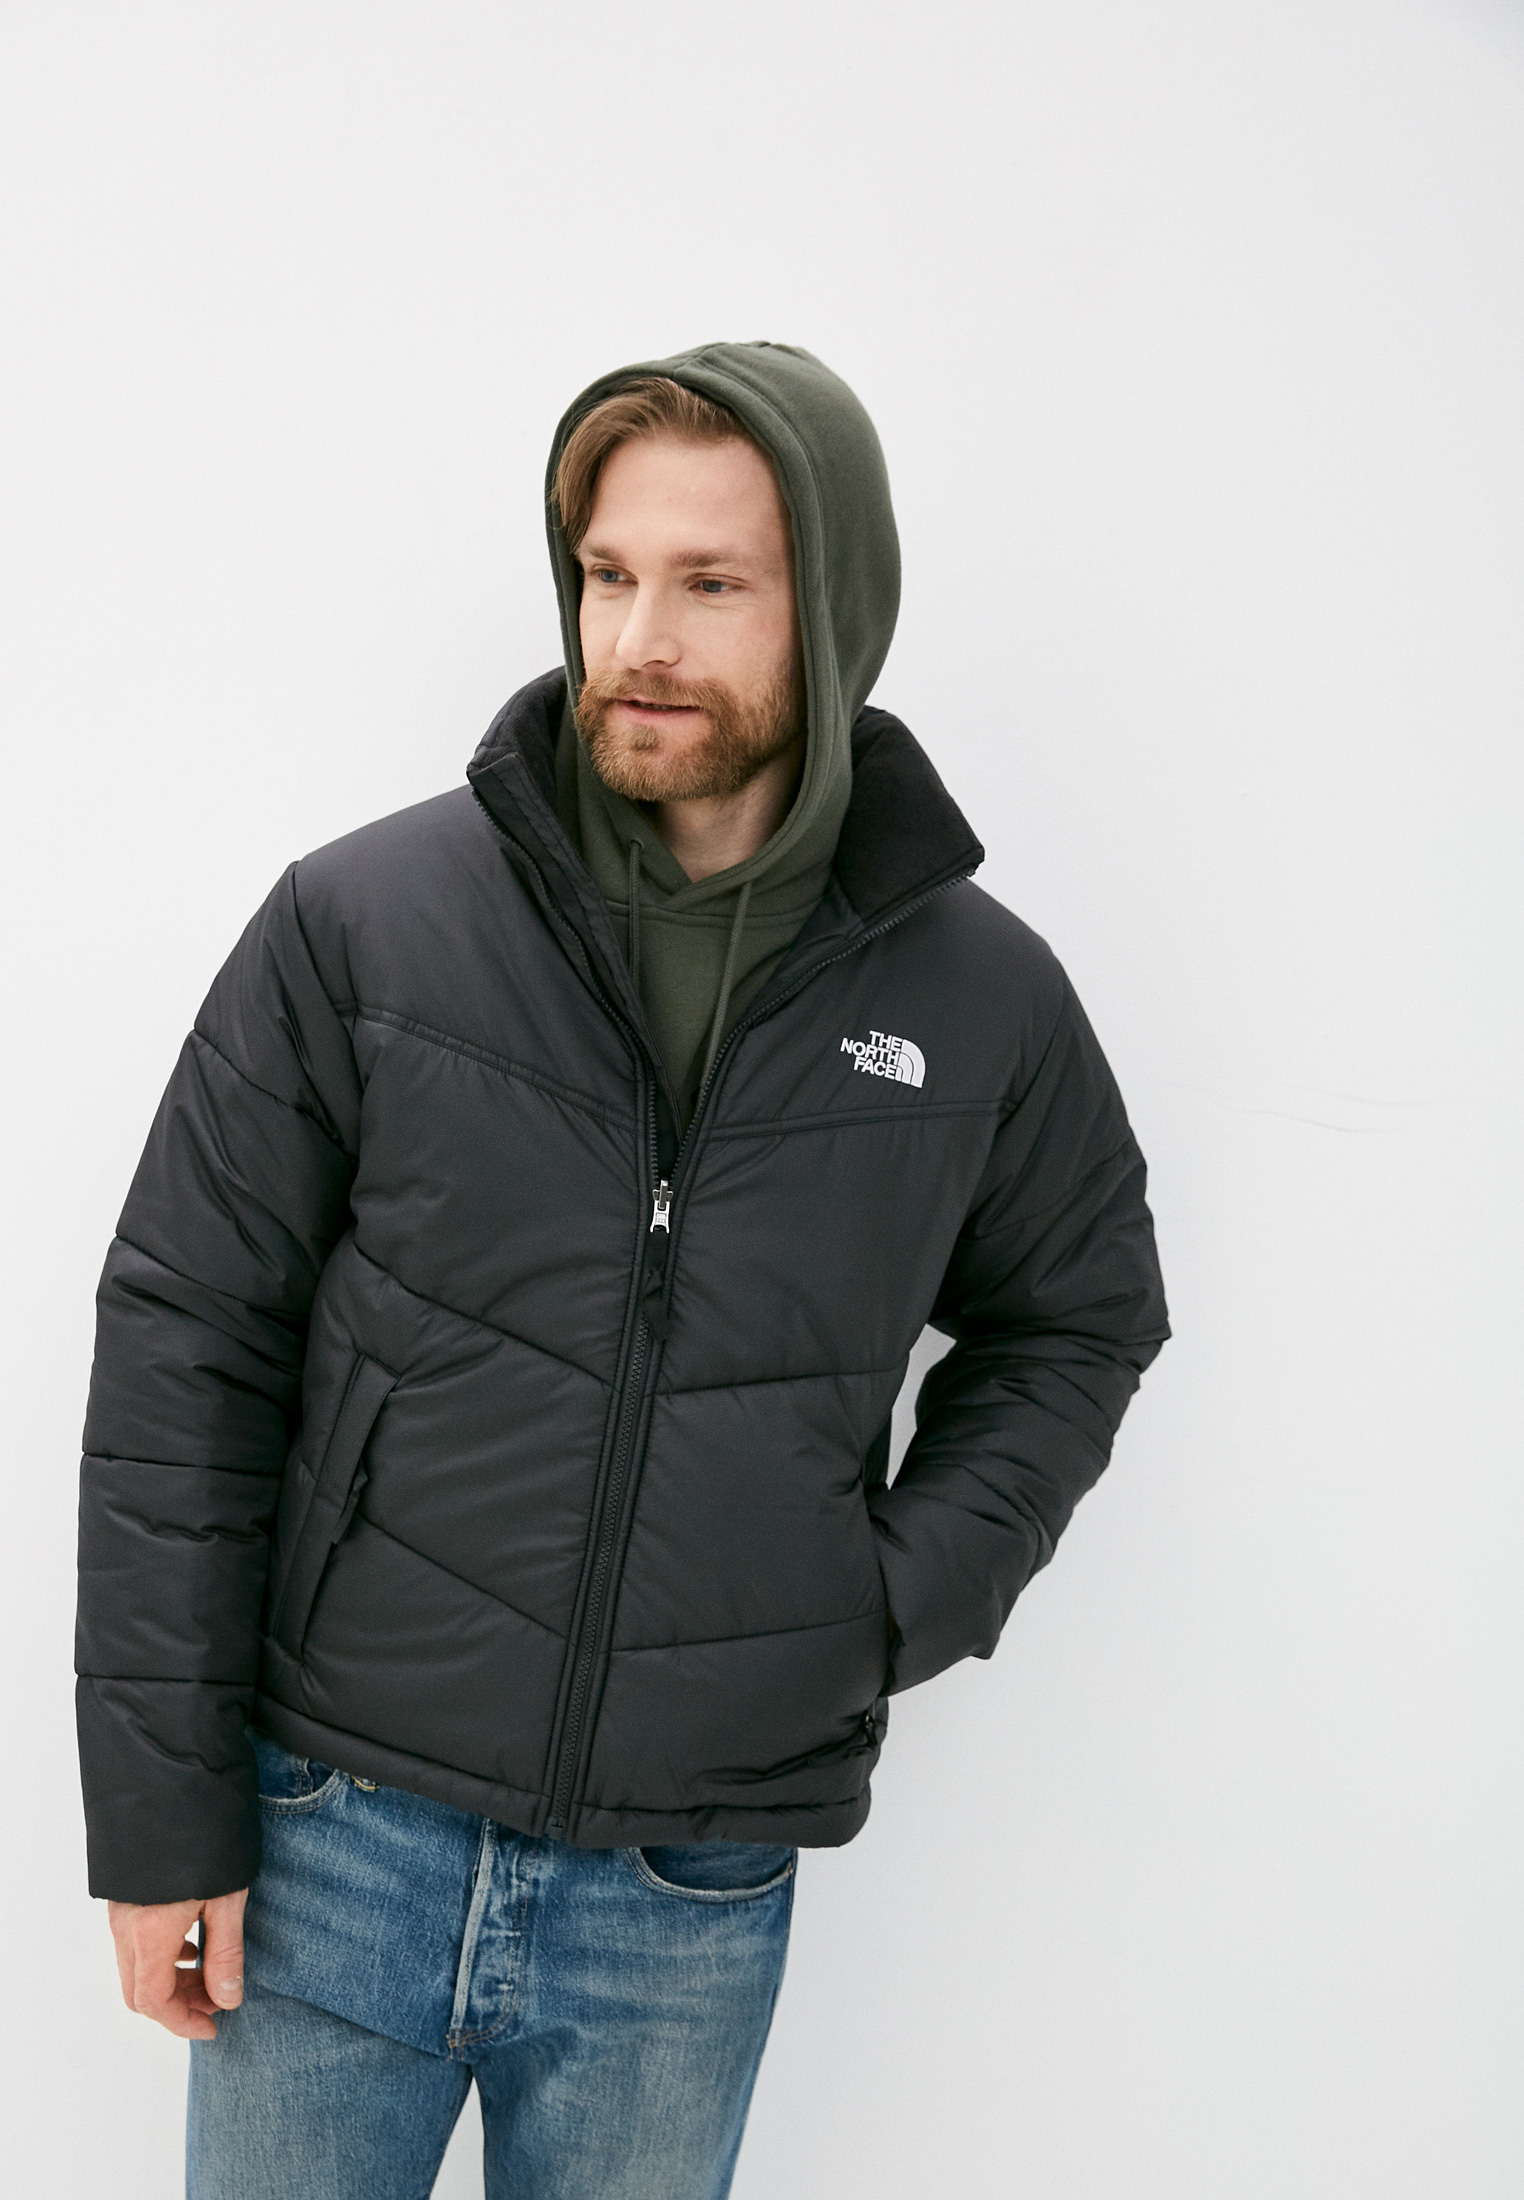 Мужская верхняя одежда The North Face (Зе Норт Фейс) TA2VEZ